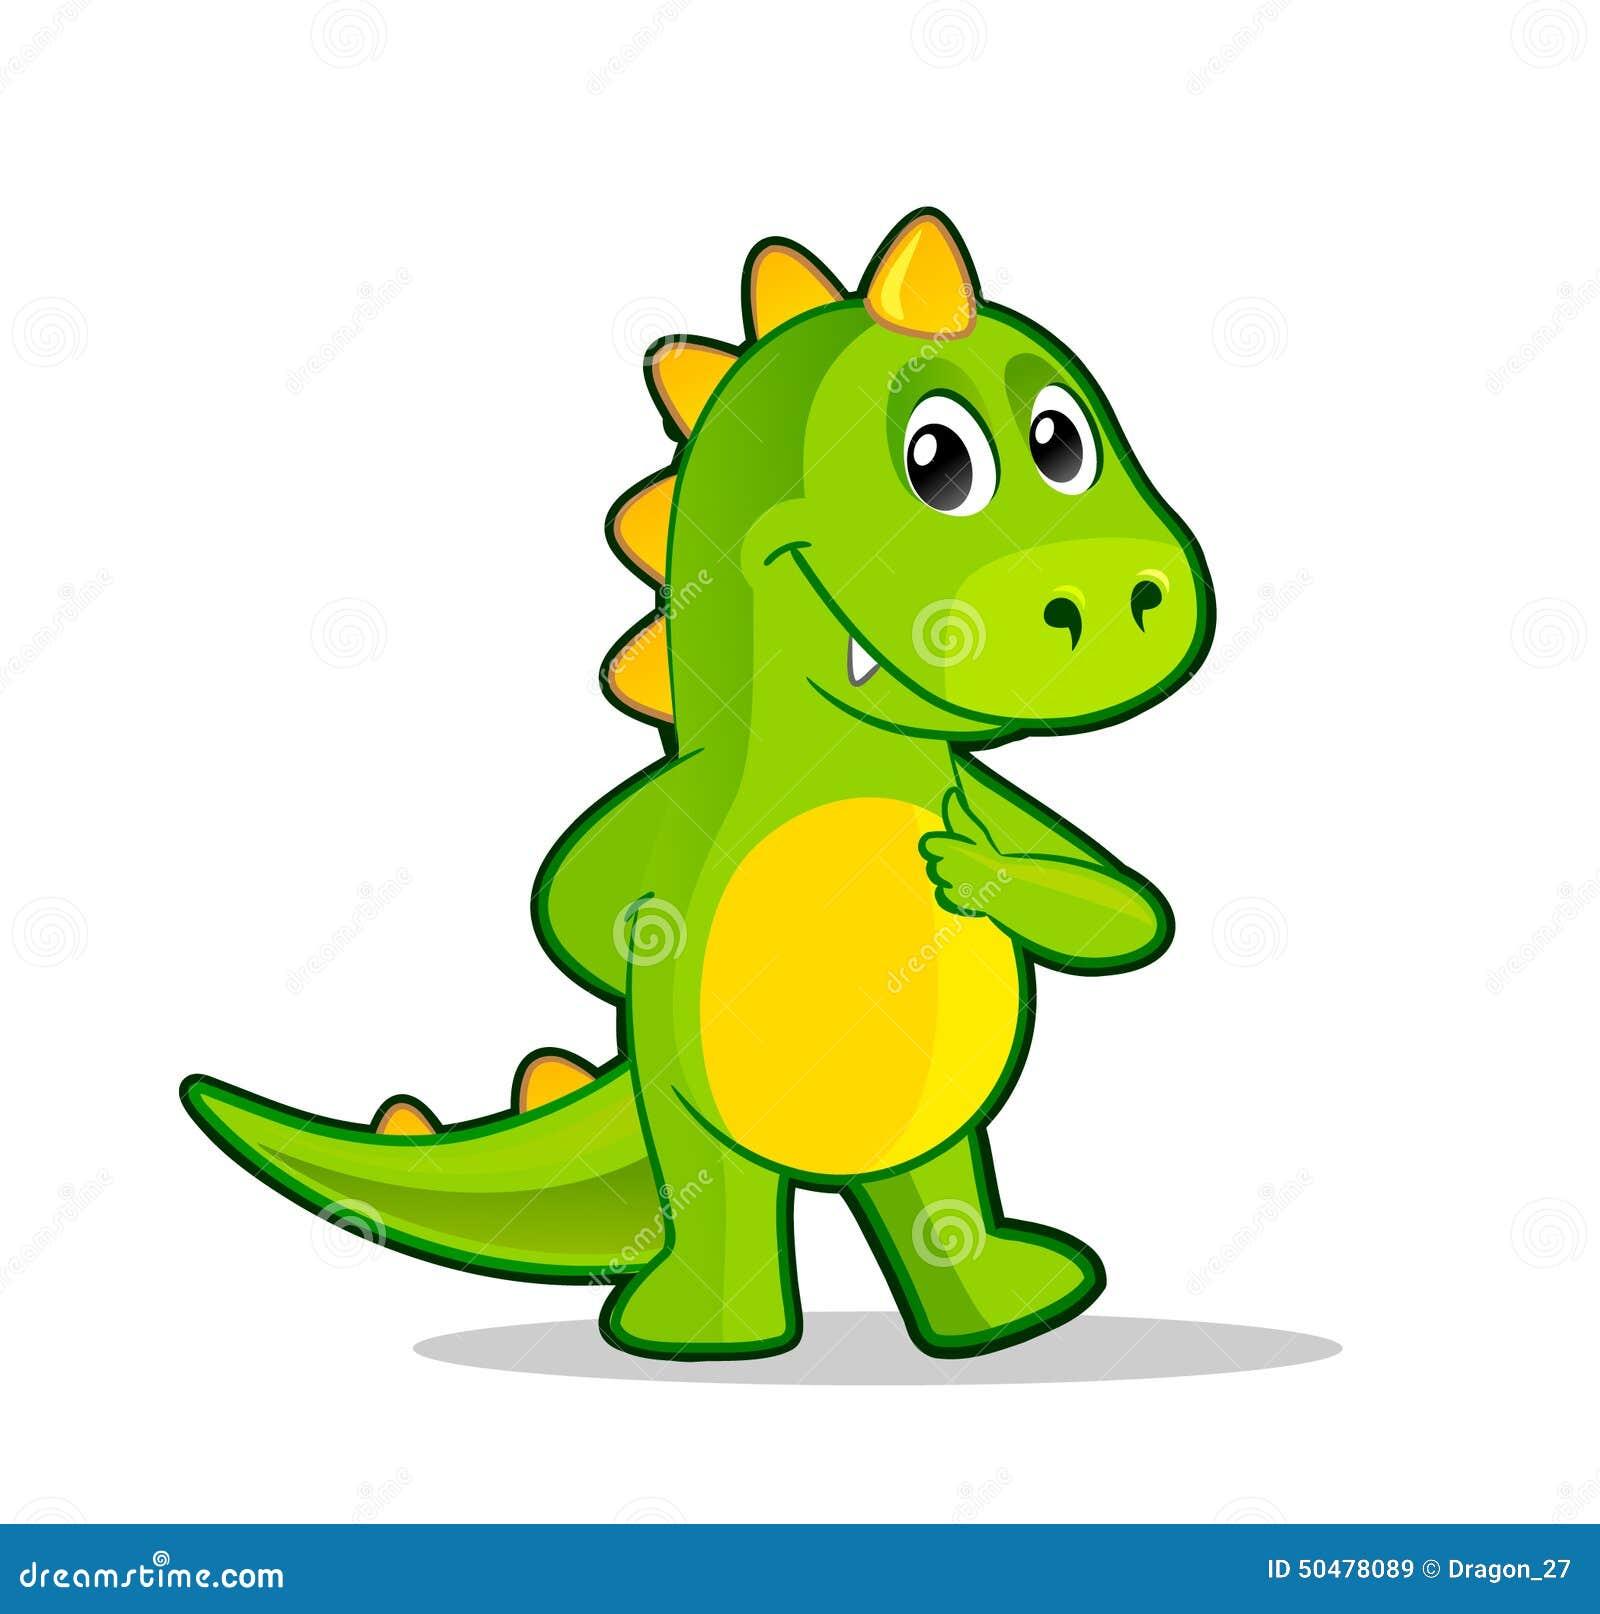 Little Cartoon Dragon Stock Vector Illustration Of Green 50478089